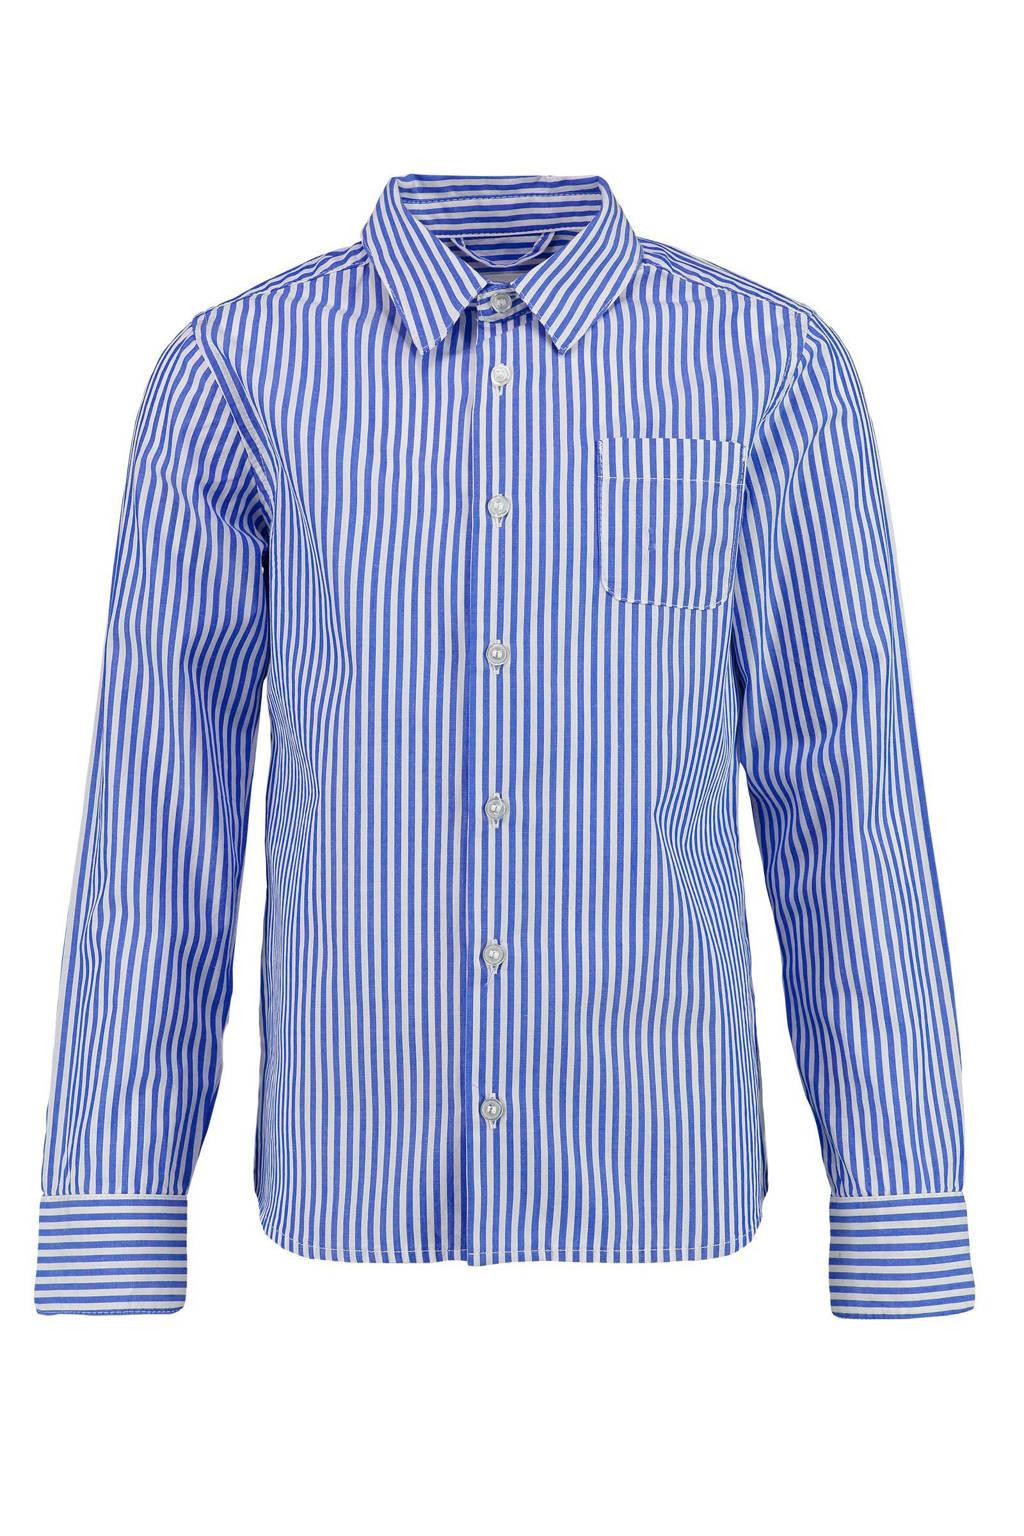 CKS KIDS gestreept overhemd Boser blauw/wit, Blauw/wit